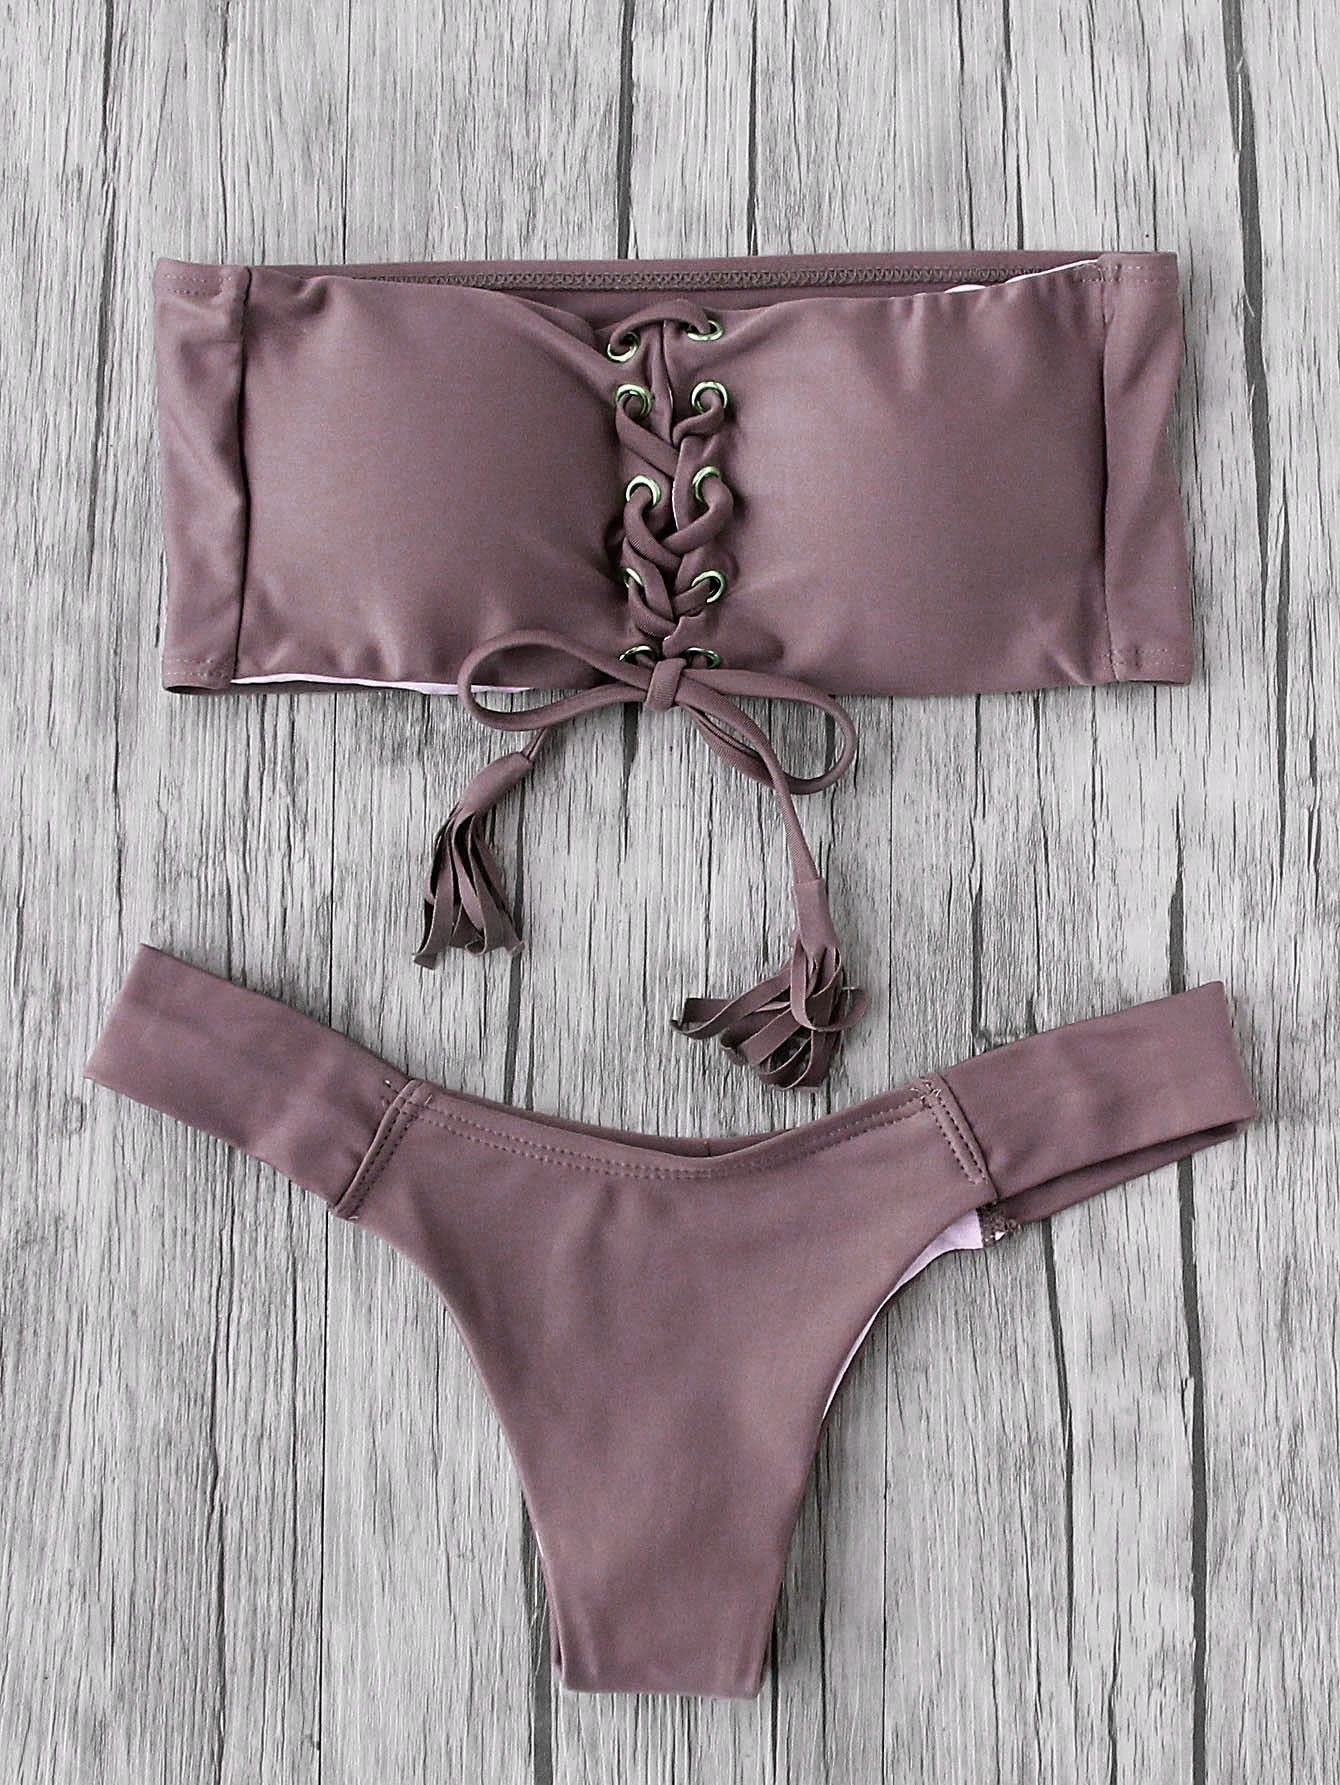 Eyelet Lace Up Tassel Bandeau Bikini Set camo lace up studded bikini set